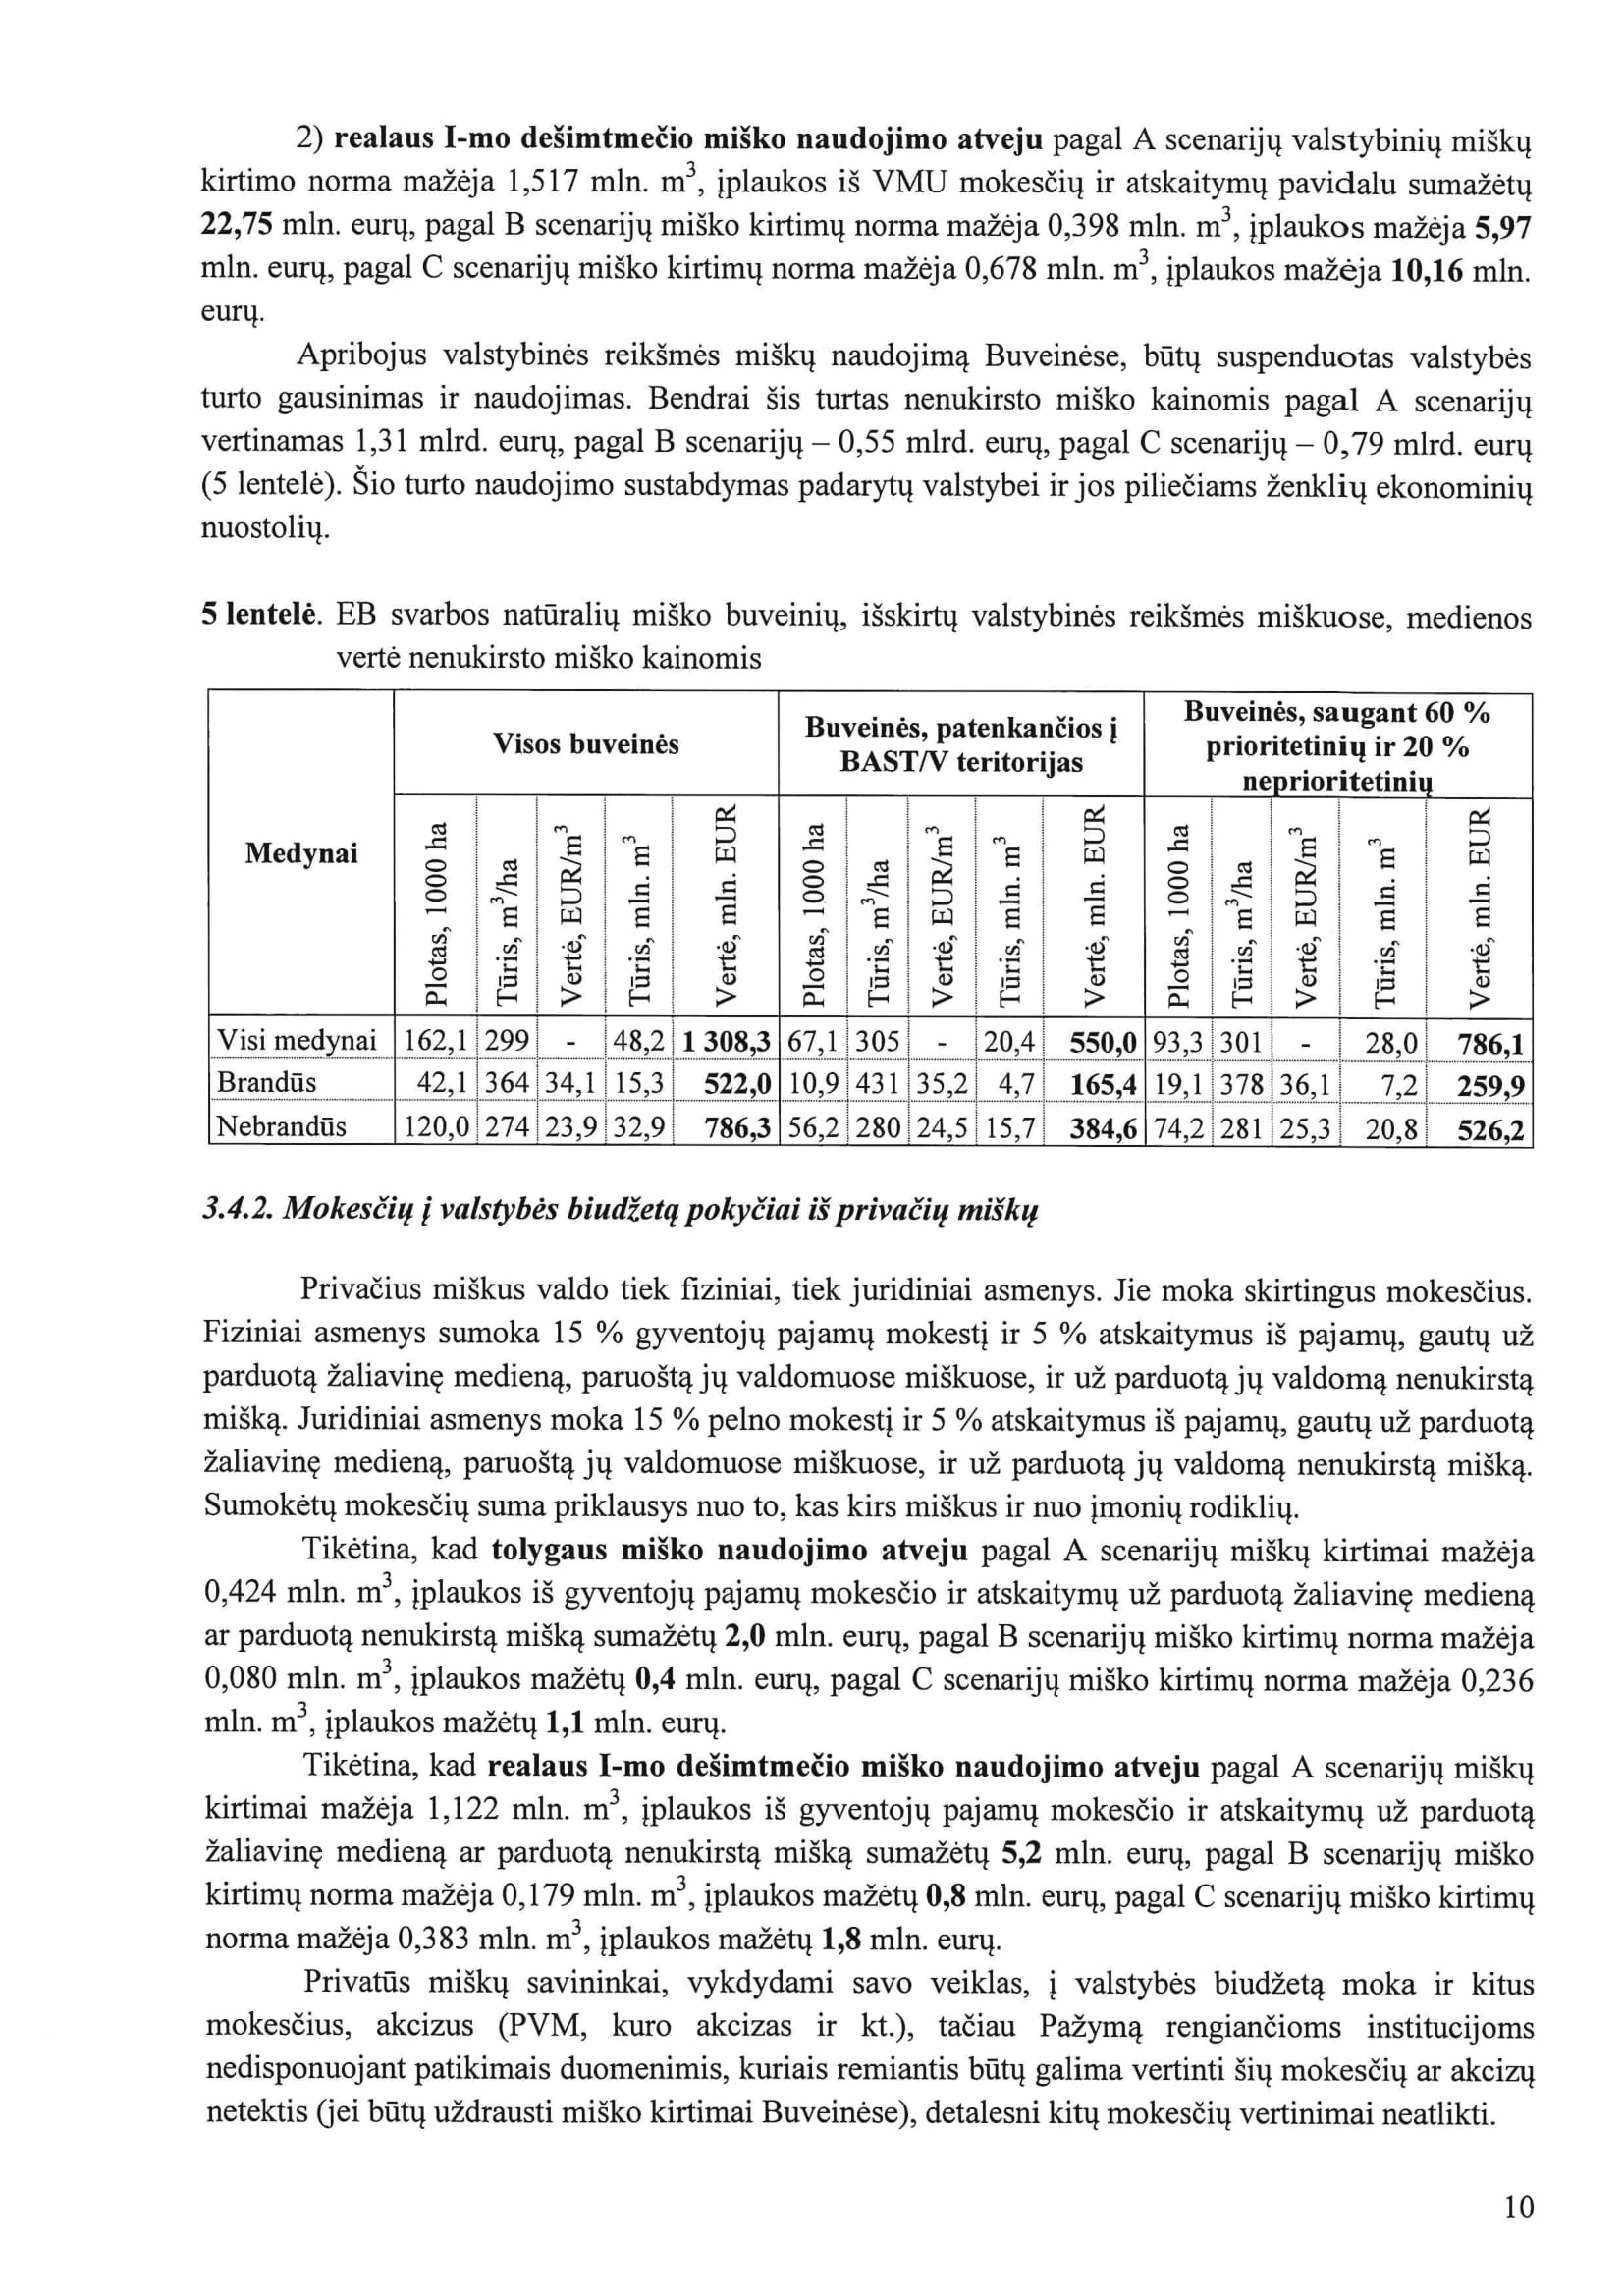 EB buveiniu Pazyma VMT VMU VSTT 2019.01.23 (su parasais)[38073]-10